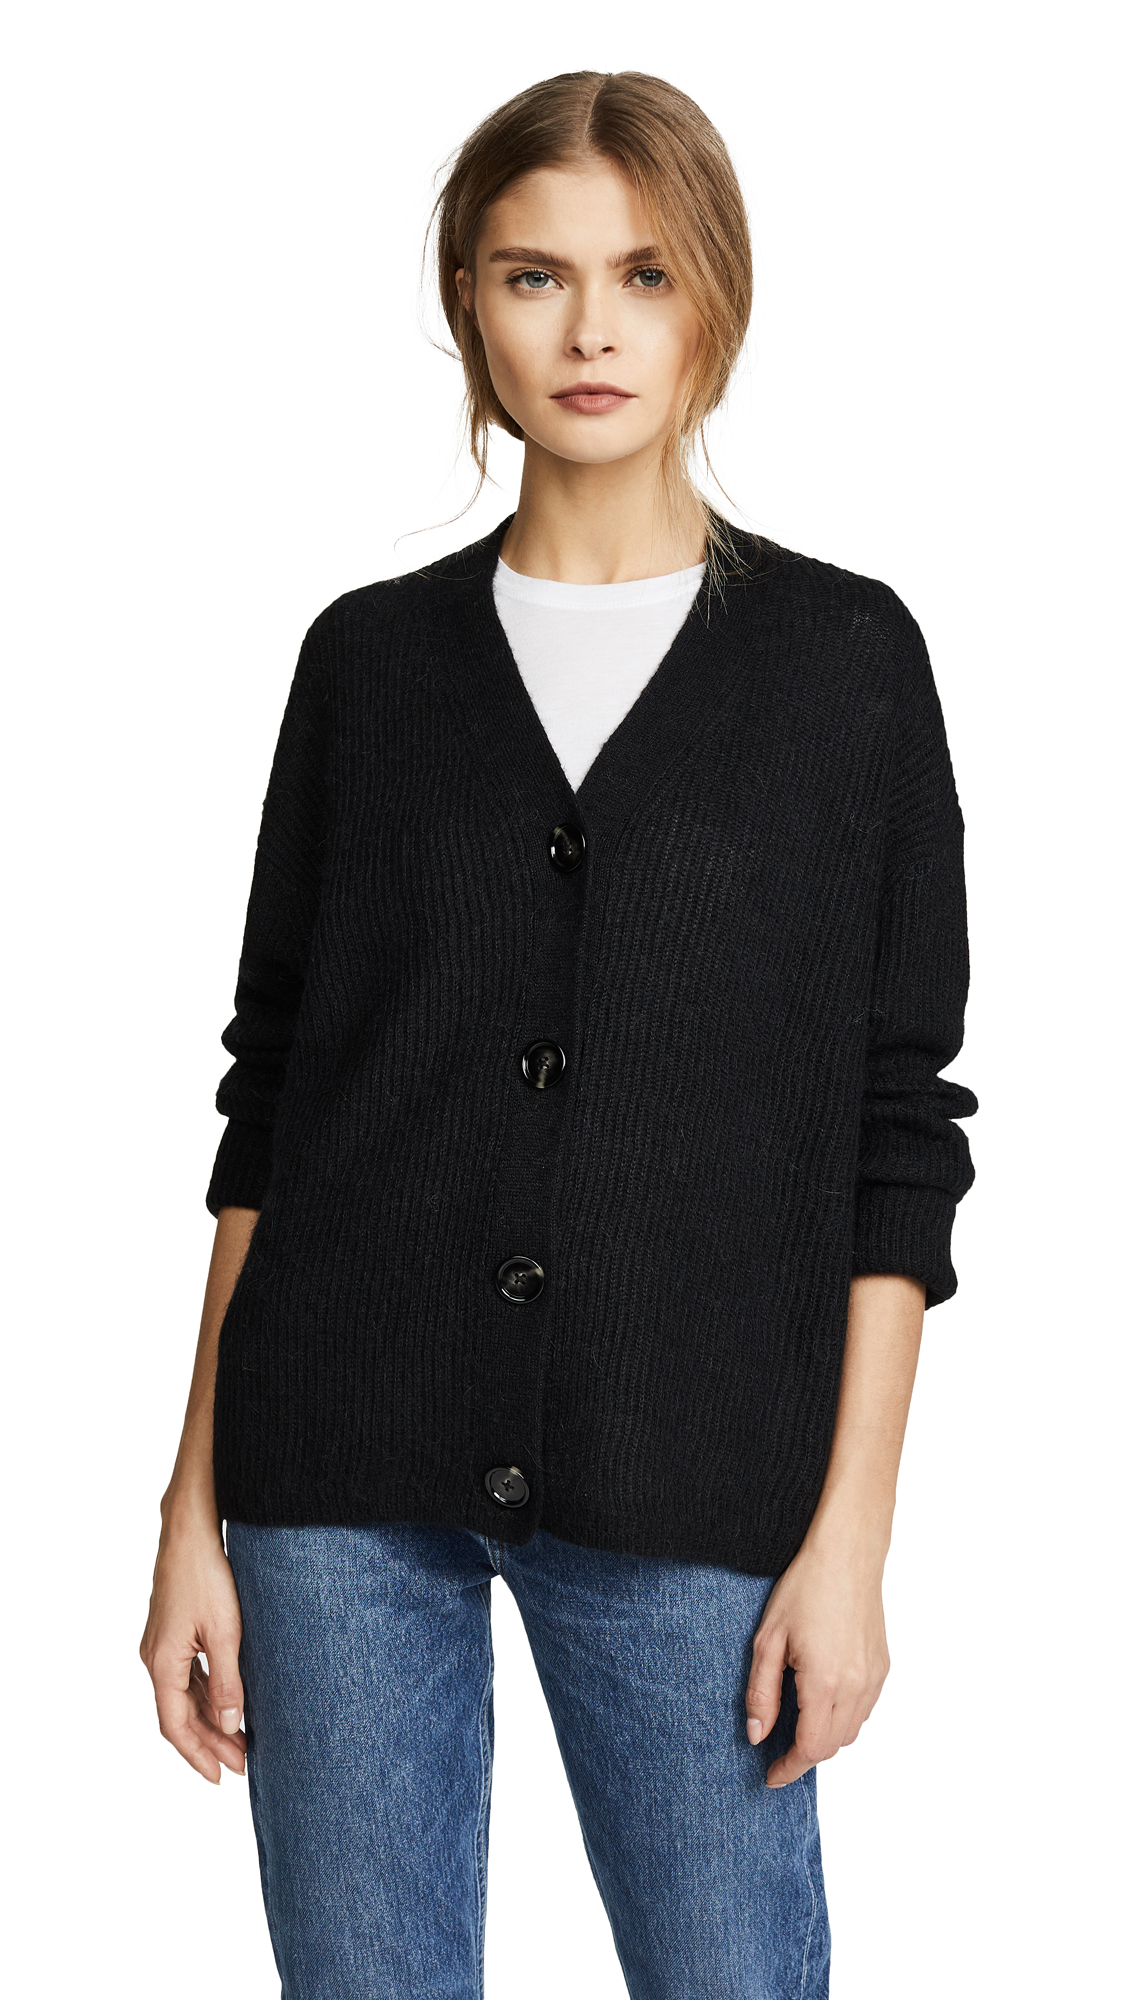 Acne Studios Ivelia Alpaca Sweater - Black